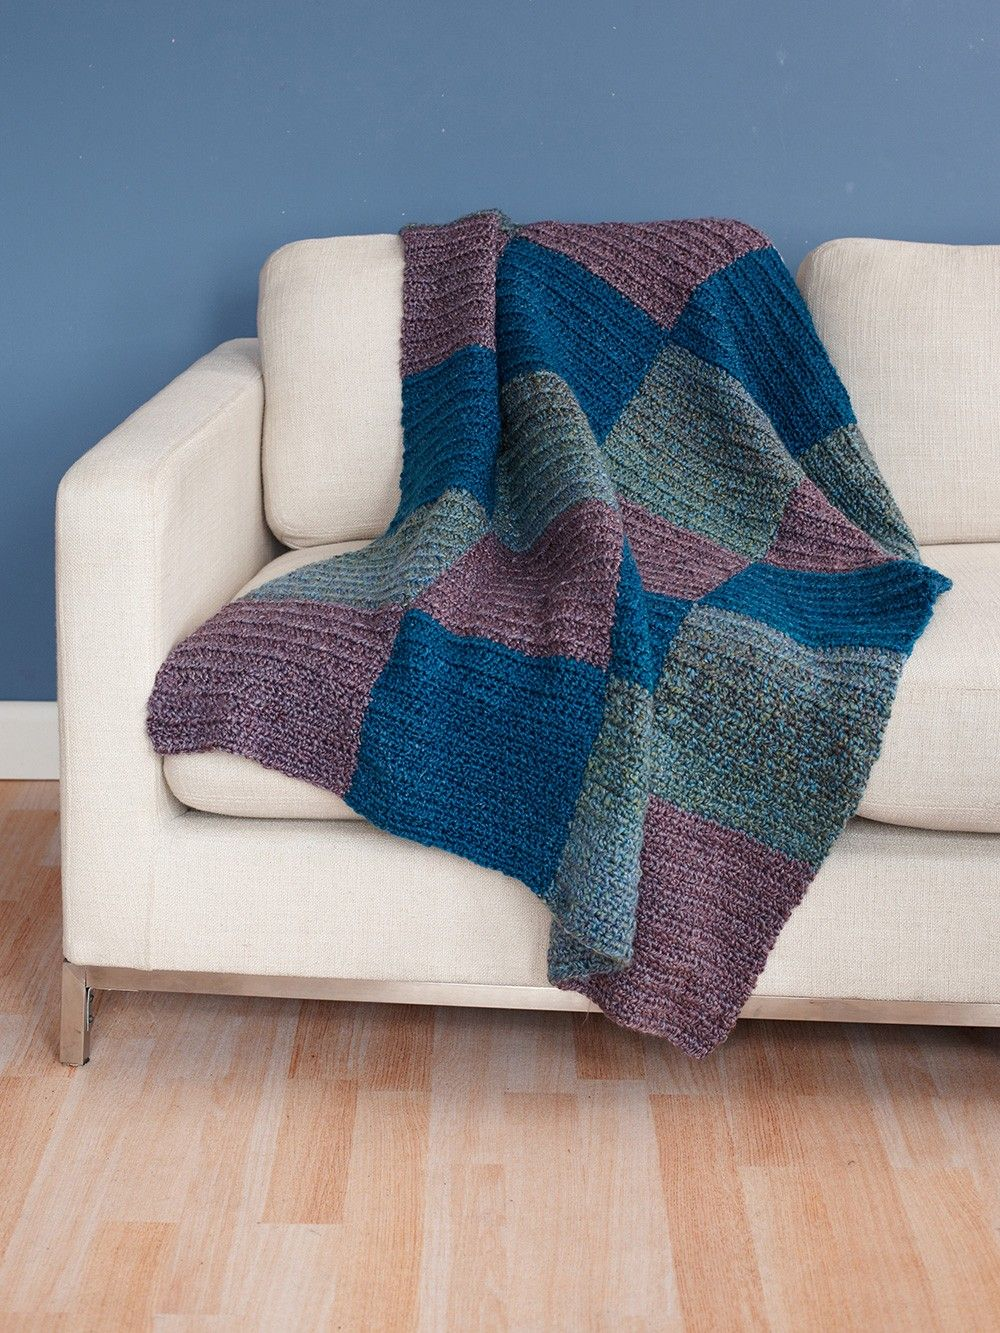 Square Deal Throw Pattern (Crochet)   My LBY wishlist   Pinterest